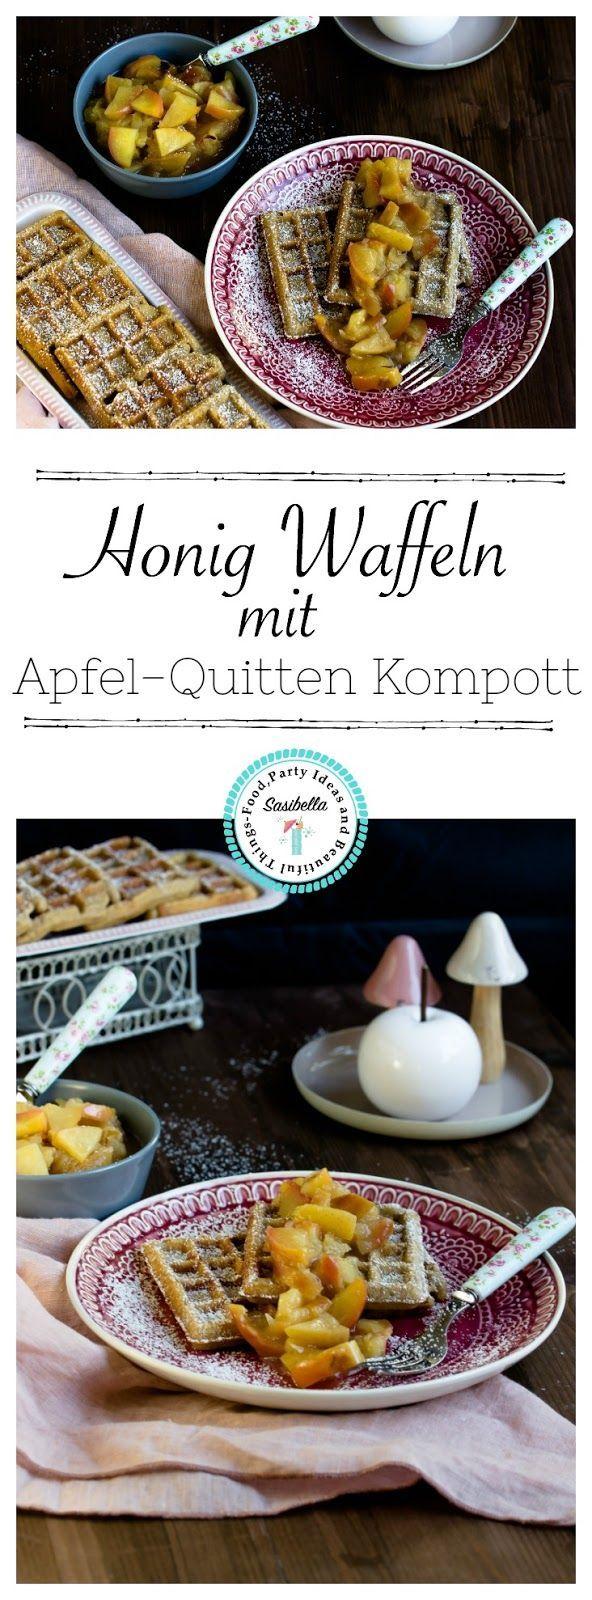 Honig-Waffeln mit Apfel-Quitten Kompott - Sasibella